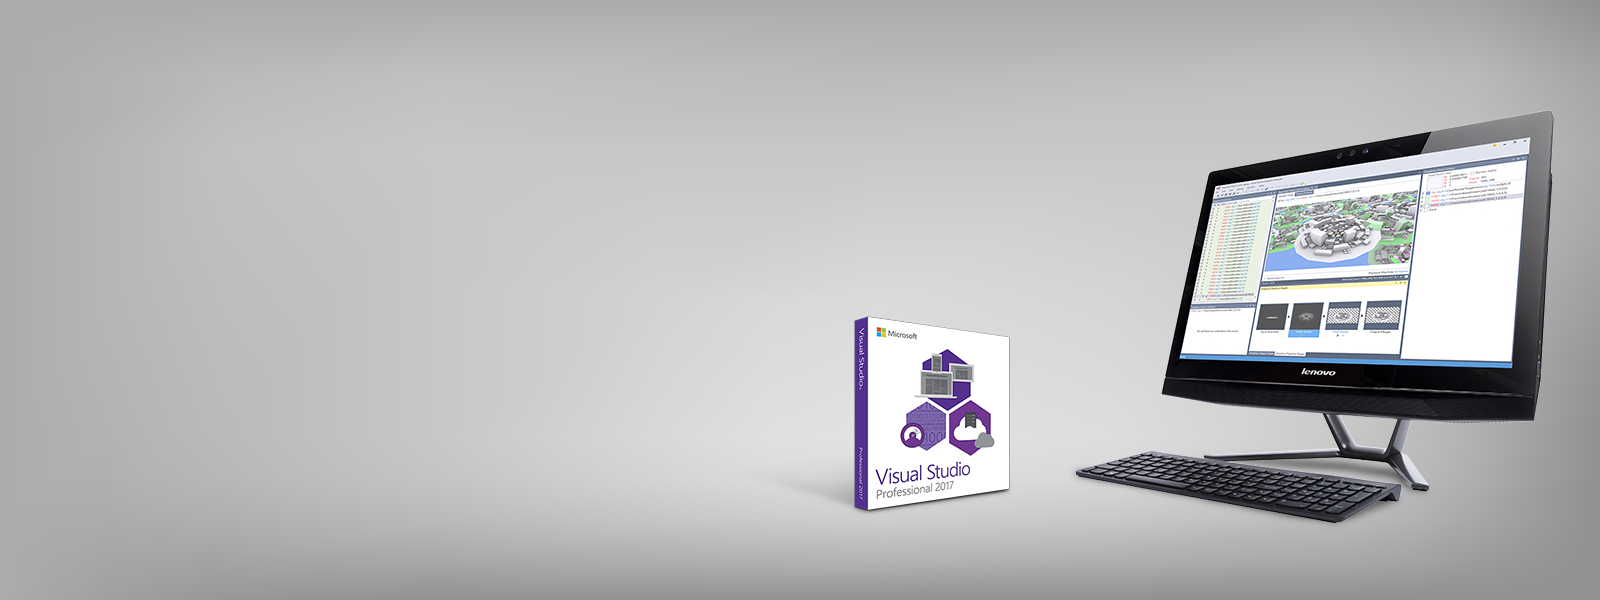 Desktop with Visual Studios and Visual Studios box